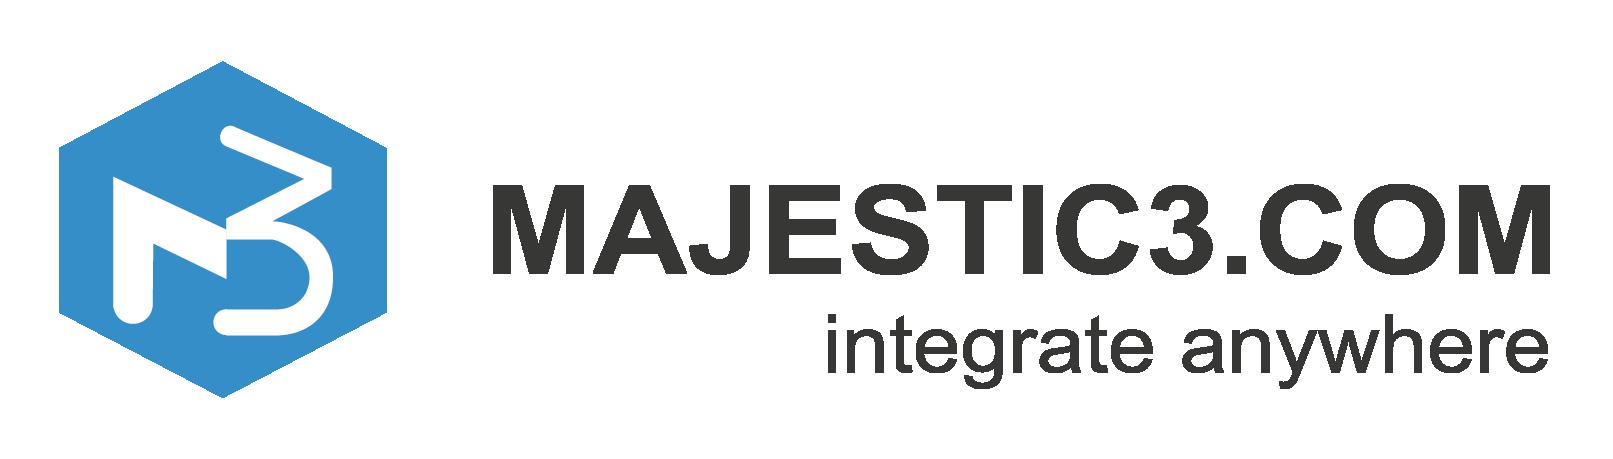 Majectic3 logo